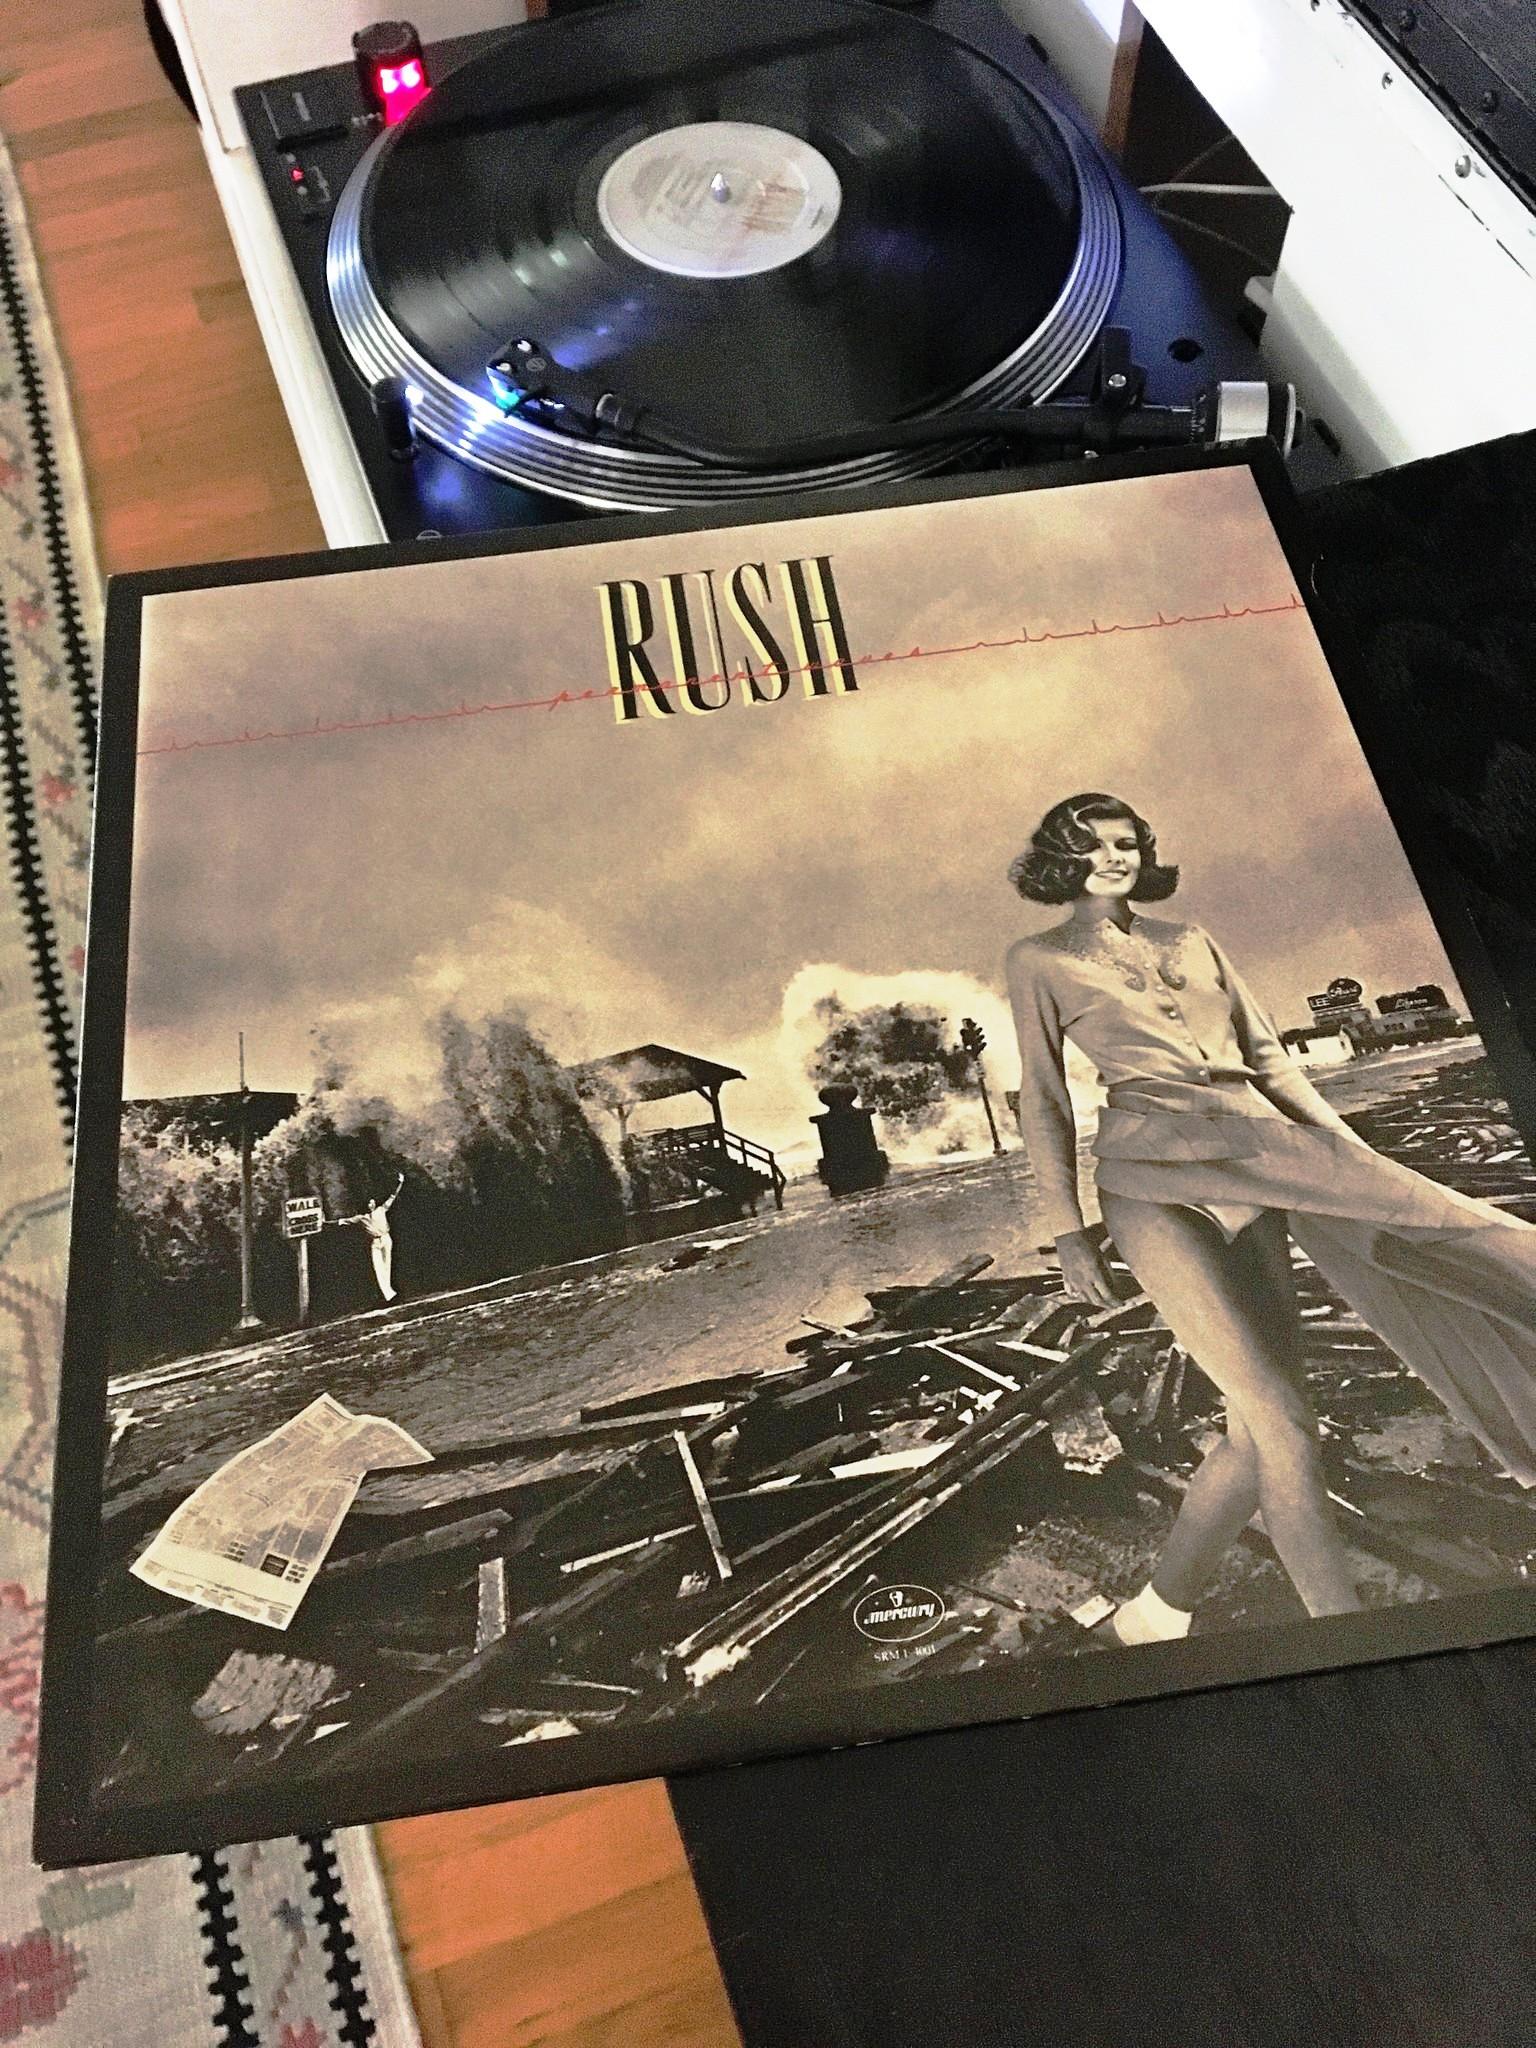 Rush Permanent Waves LP